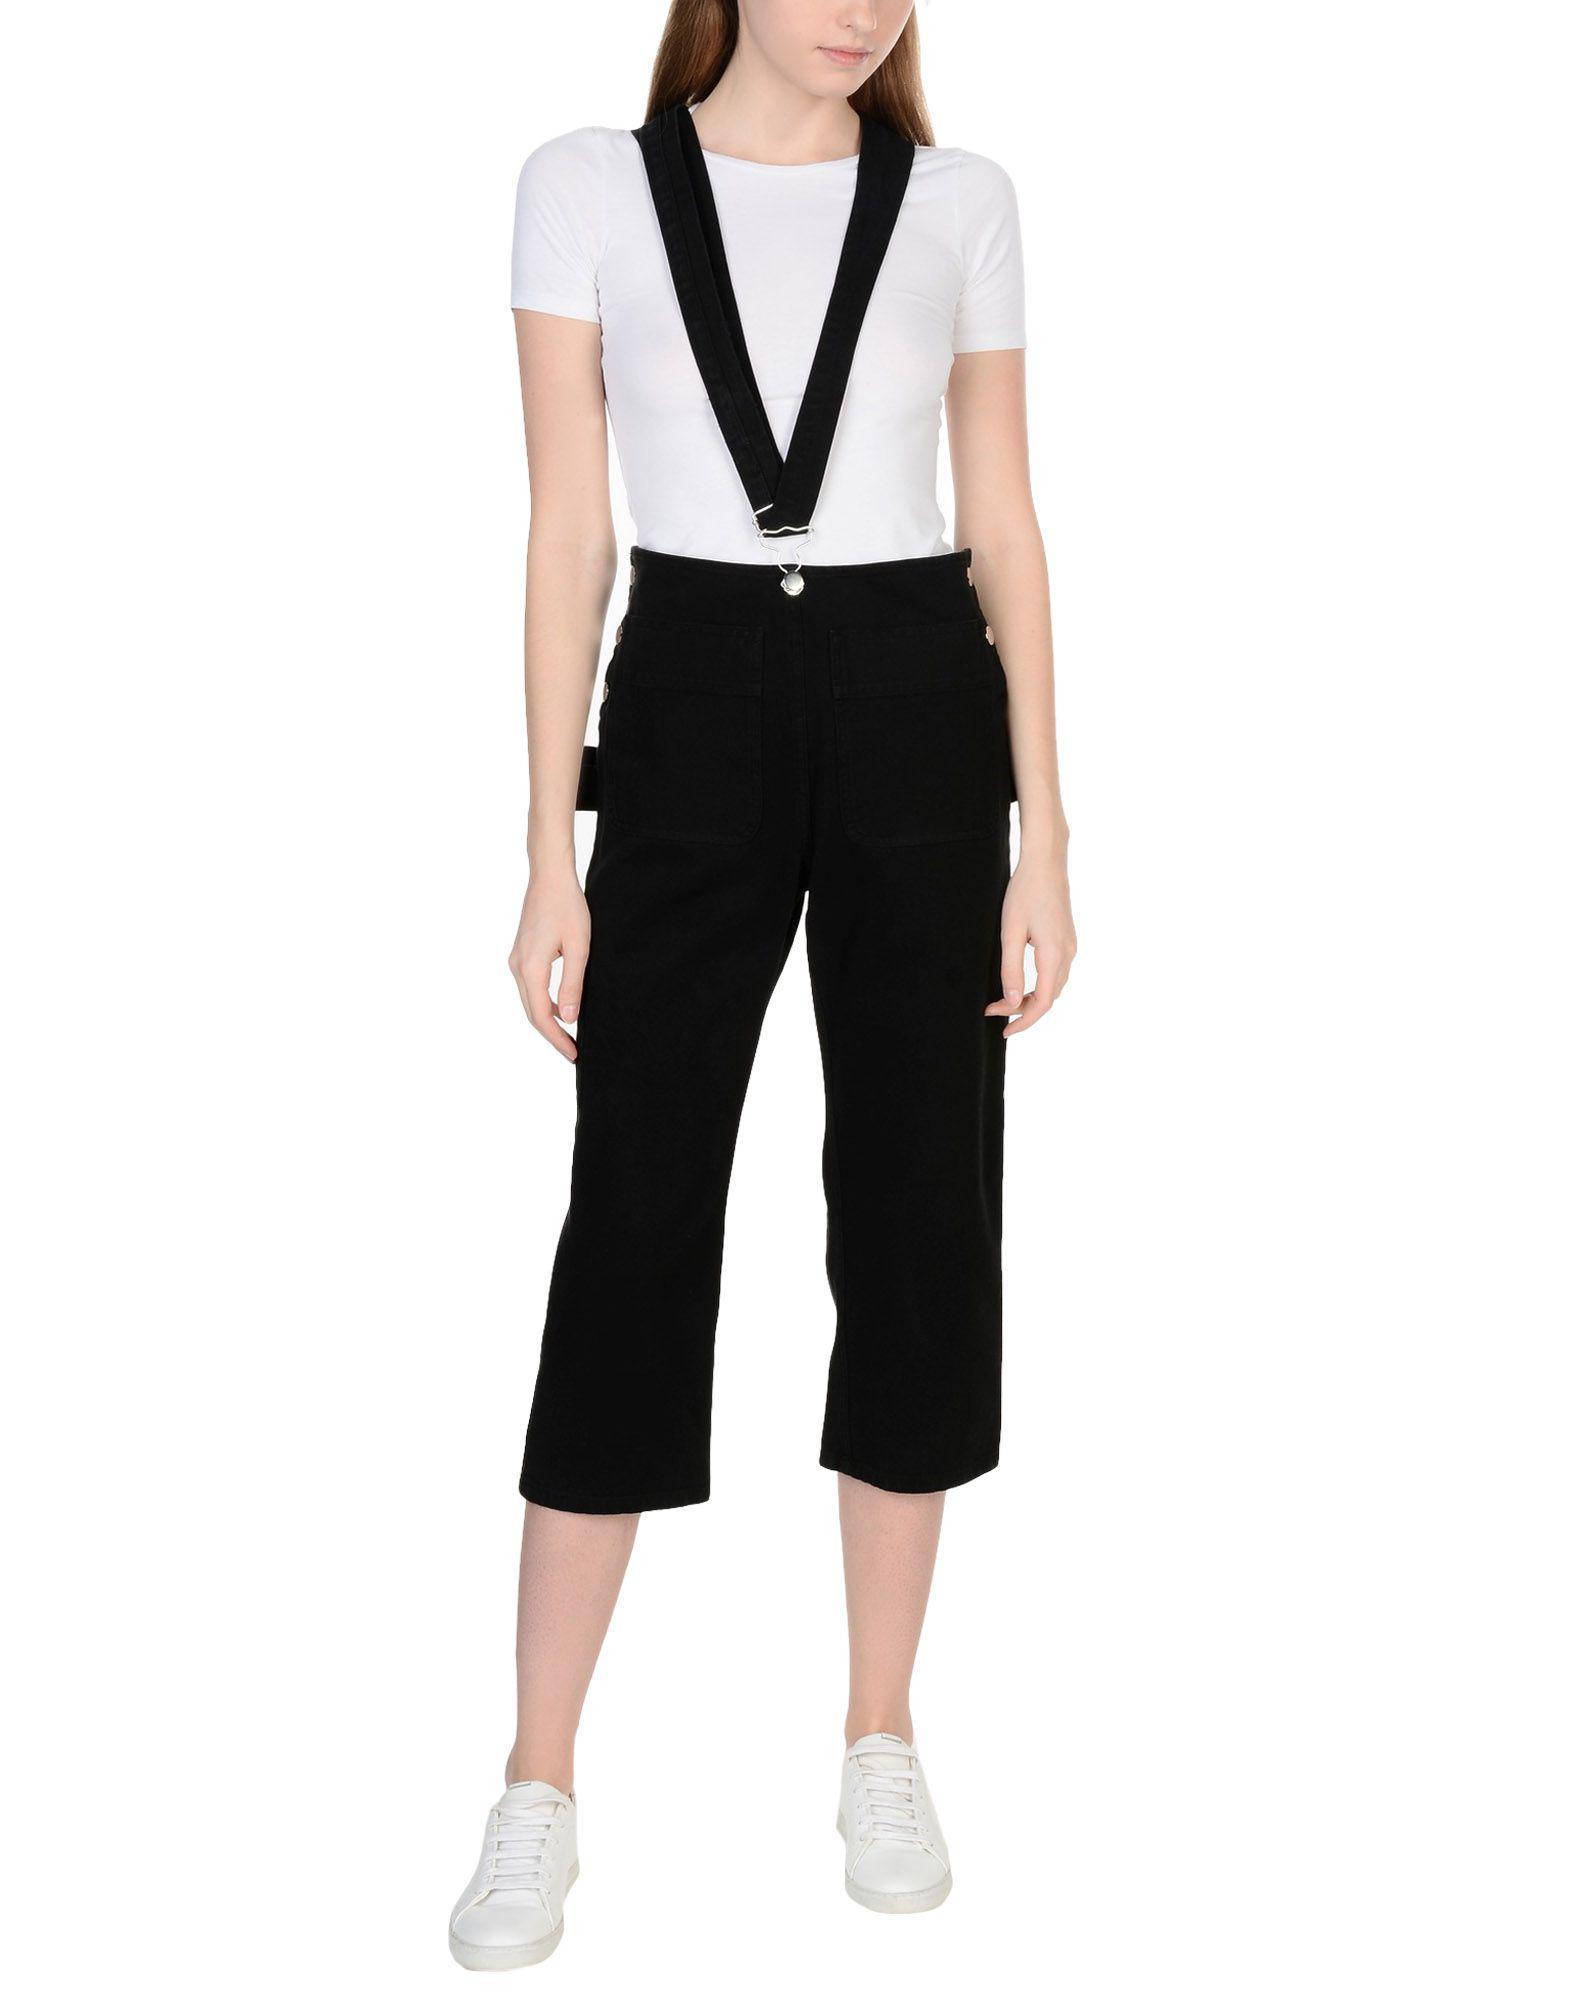 Black and White Trompe LOeil Jumpsuit Maison Martin Margiela Top Quality Online Hot Sale Sale Online Pay With Visa Online How Much VTp748tmX